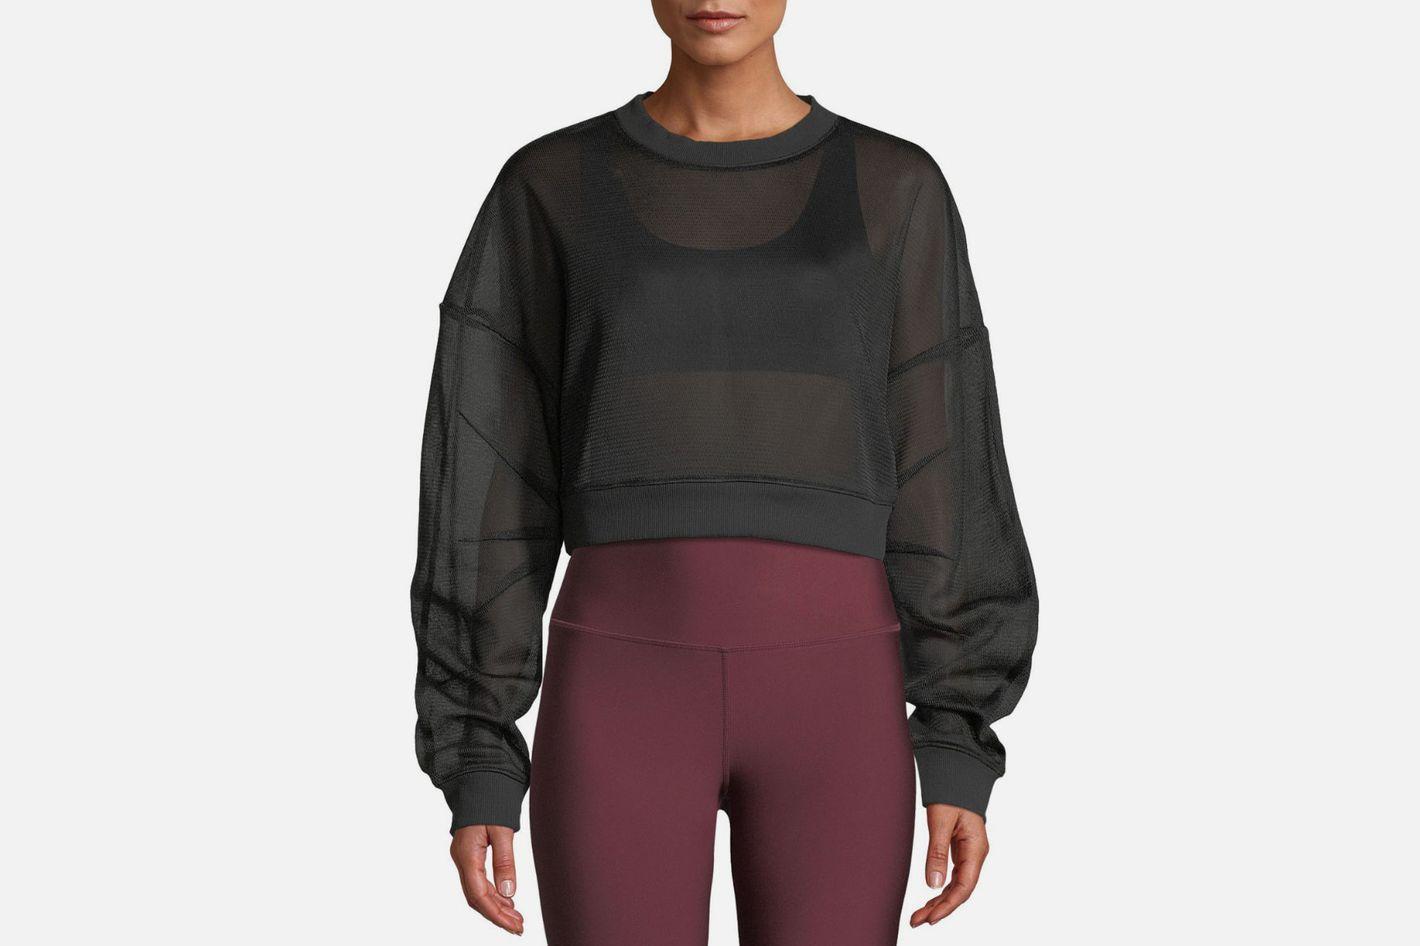 Alo Yoga Rowe Mesh Sheer Cropped Pullover Sweatshirt